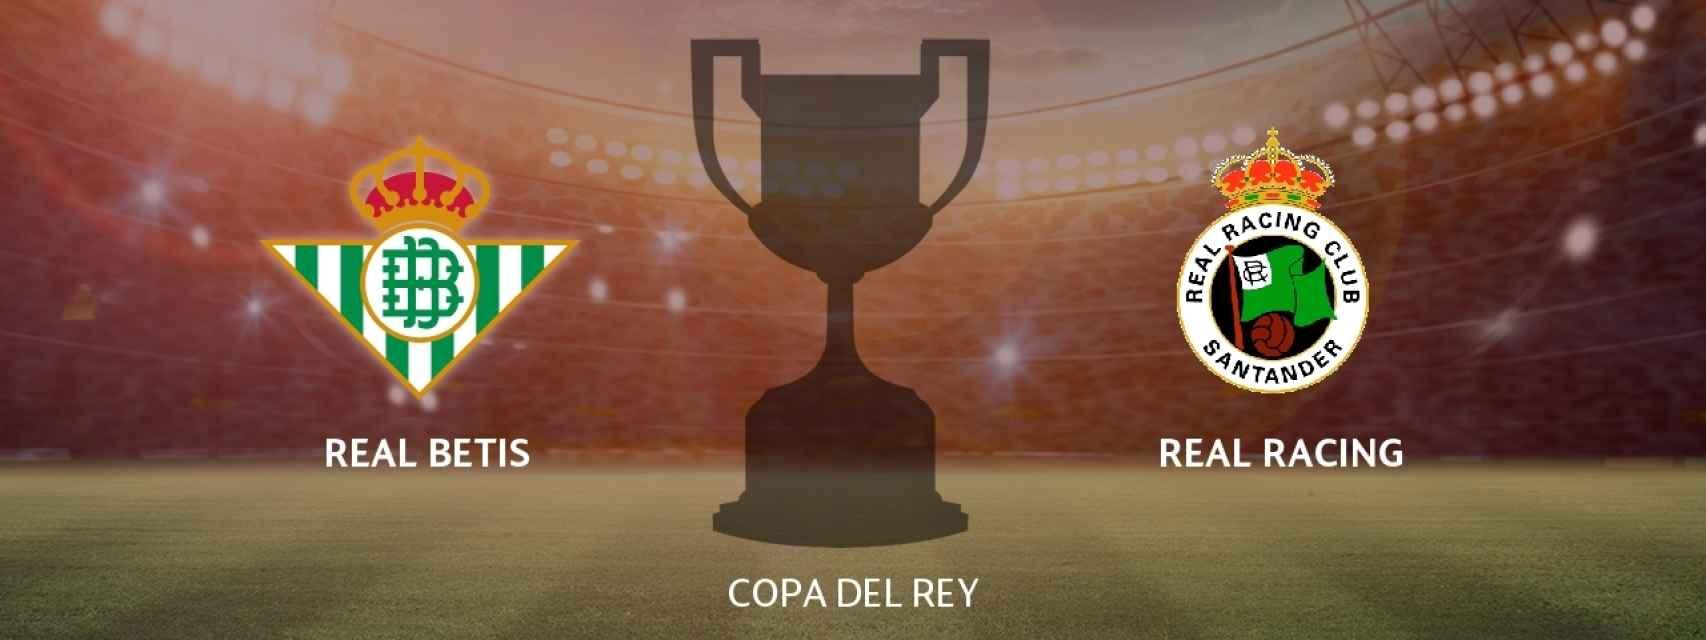 Real Betis - Racing